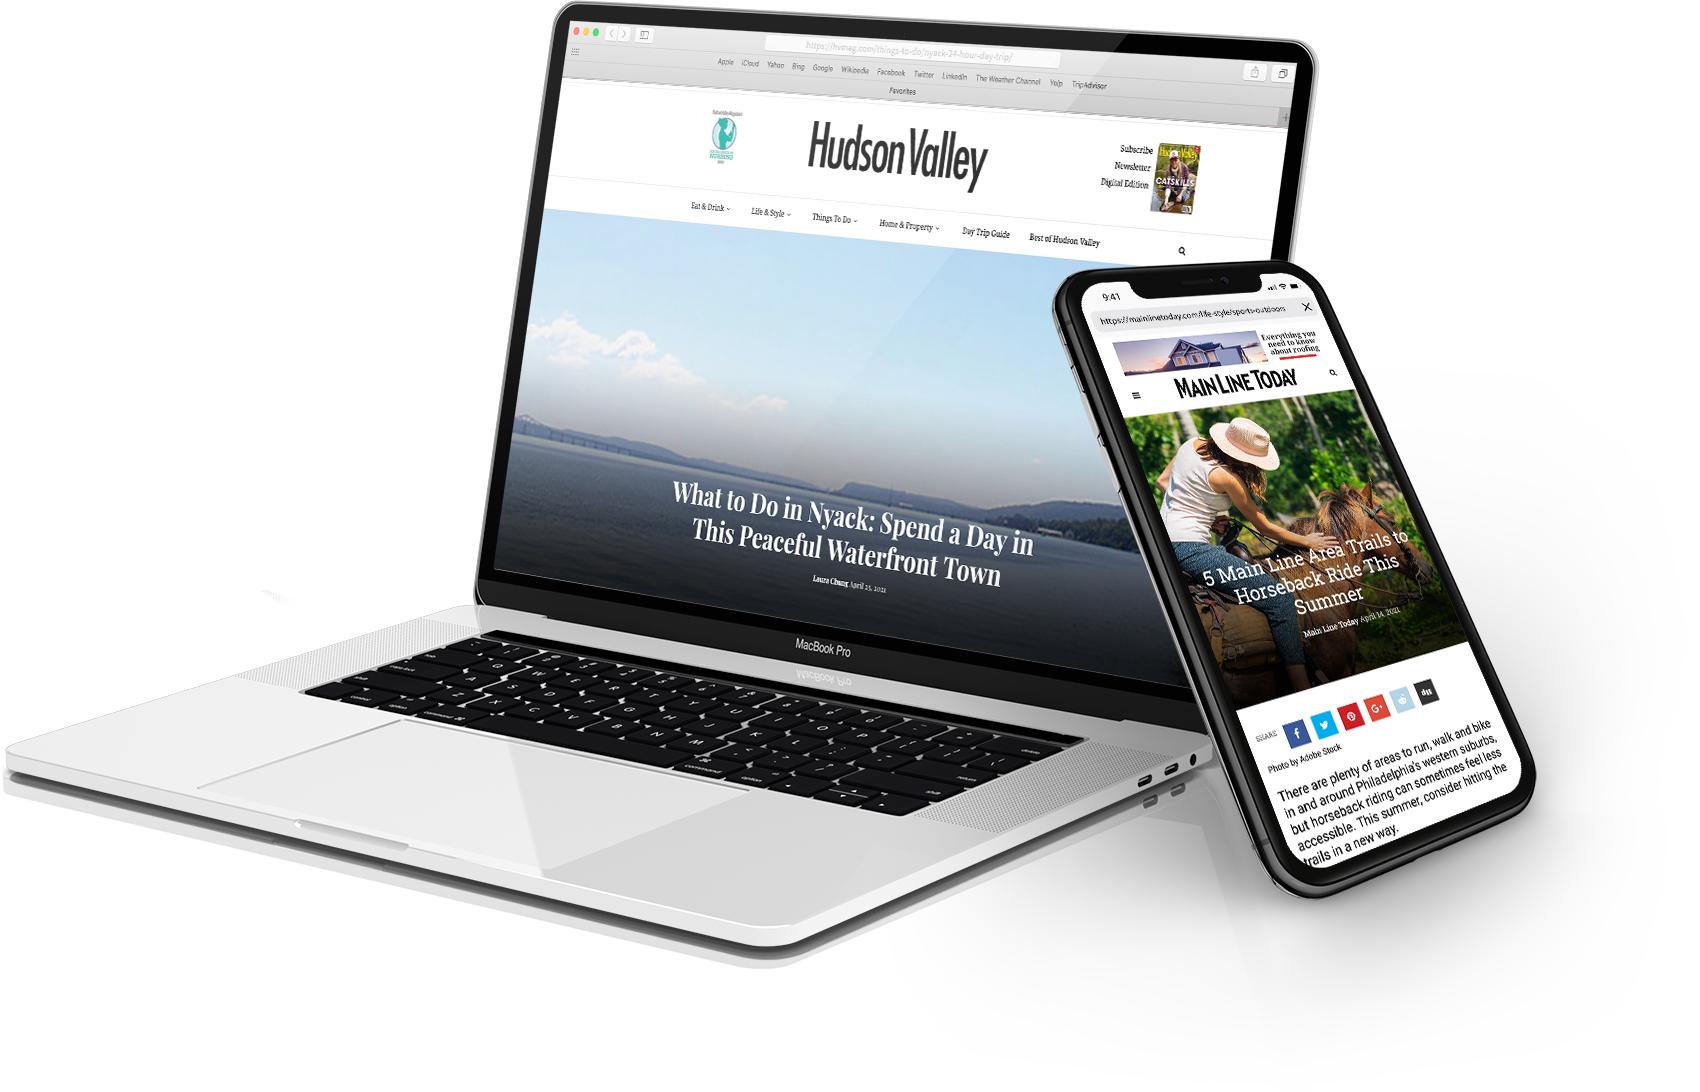 Hudson Valley & Main Line Today Websites